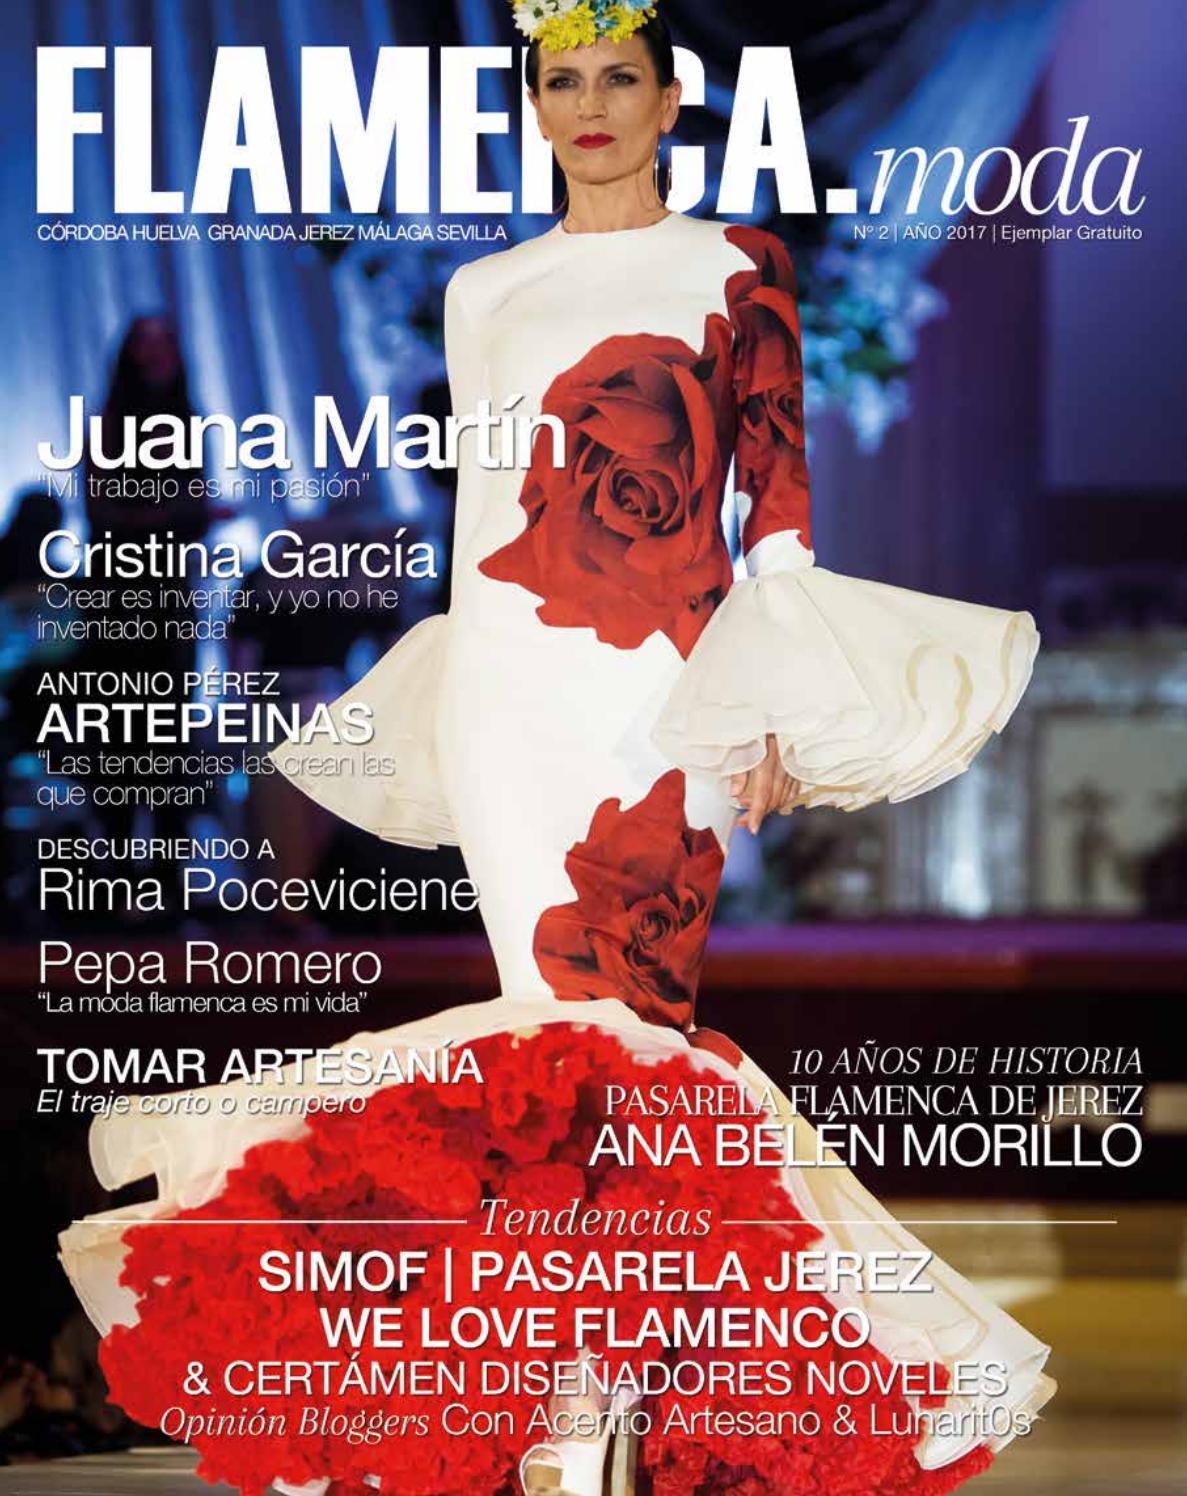 Flamenca.moda nº 2 by Flamenca.moda - issuu 169deaa54114